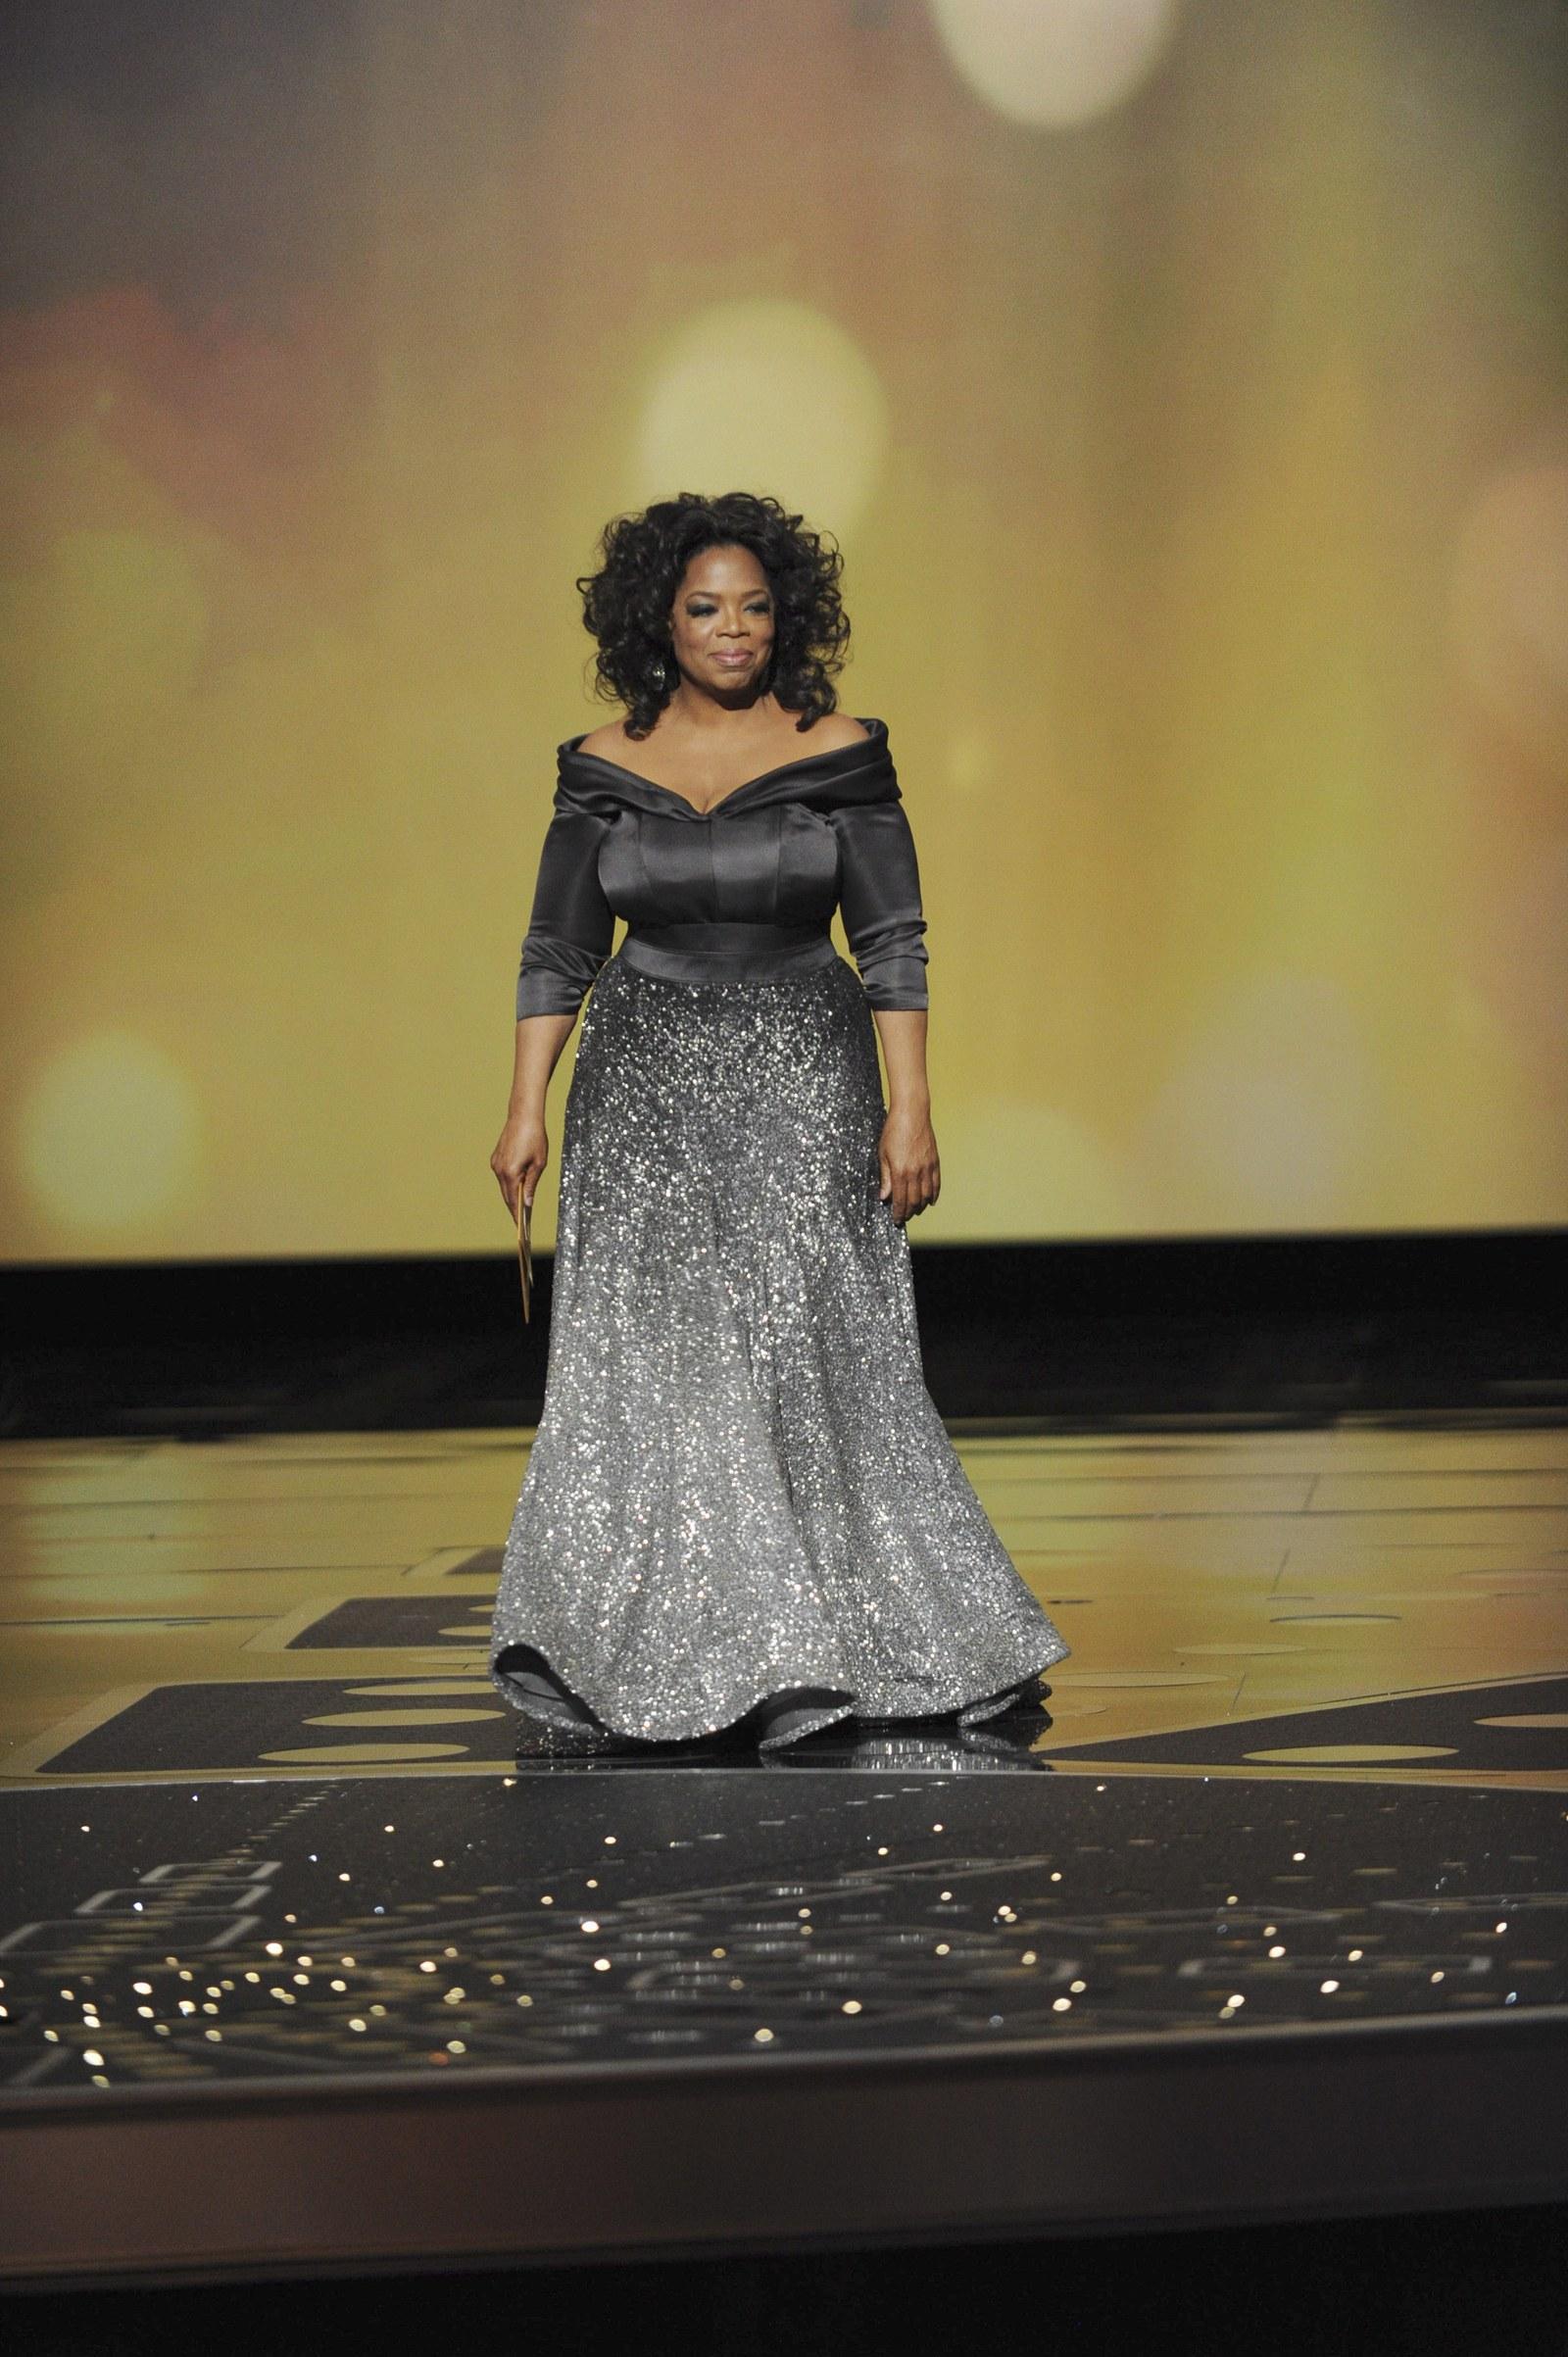 Oprah Winfrey 2011 Academy Awards - thiết kế Zac Posen